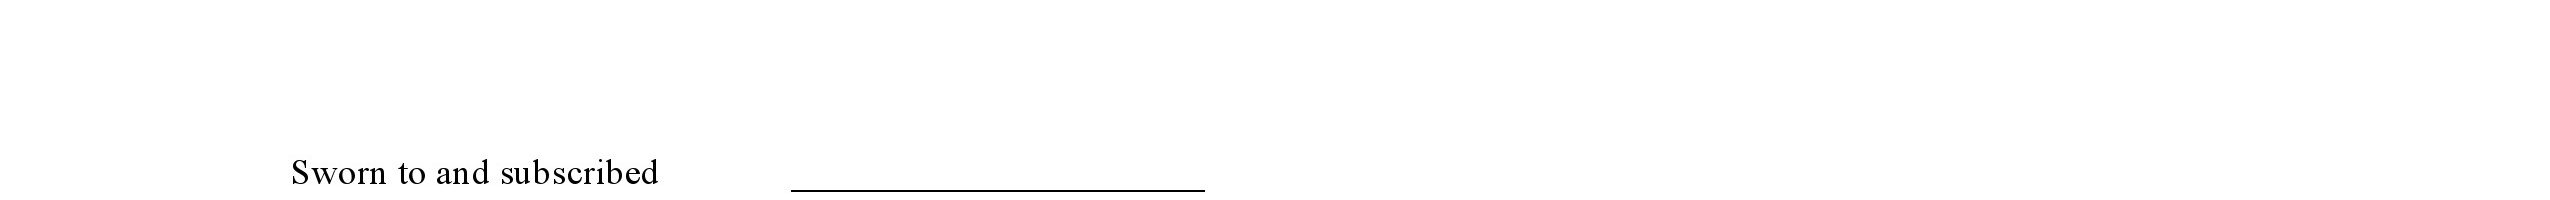 Blank Affidavit Template Form